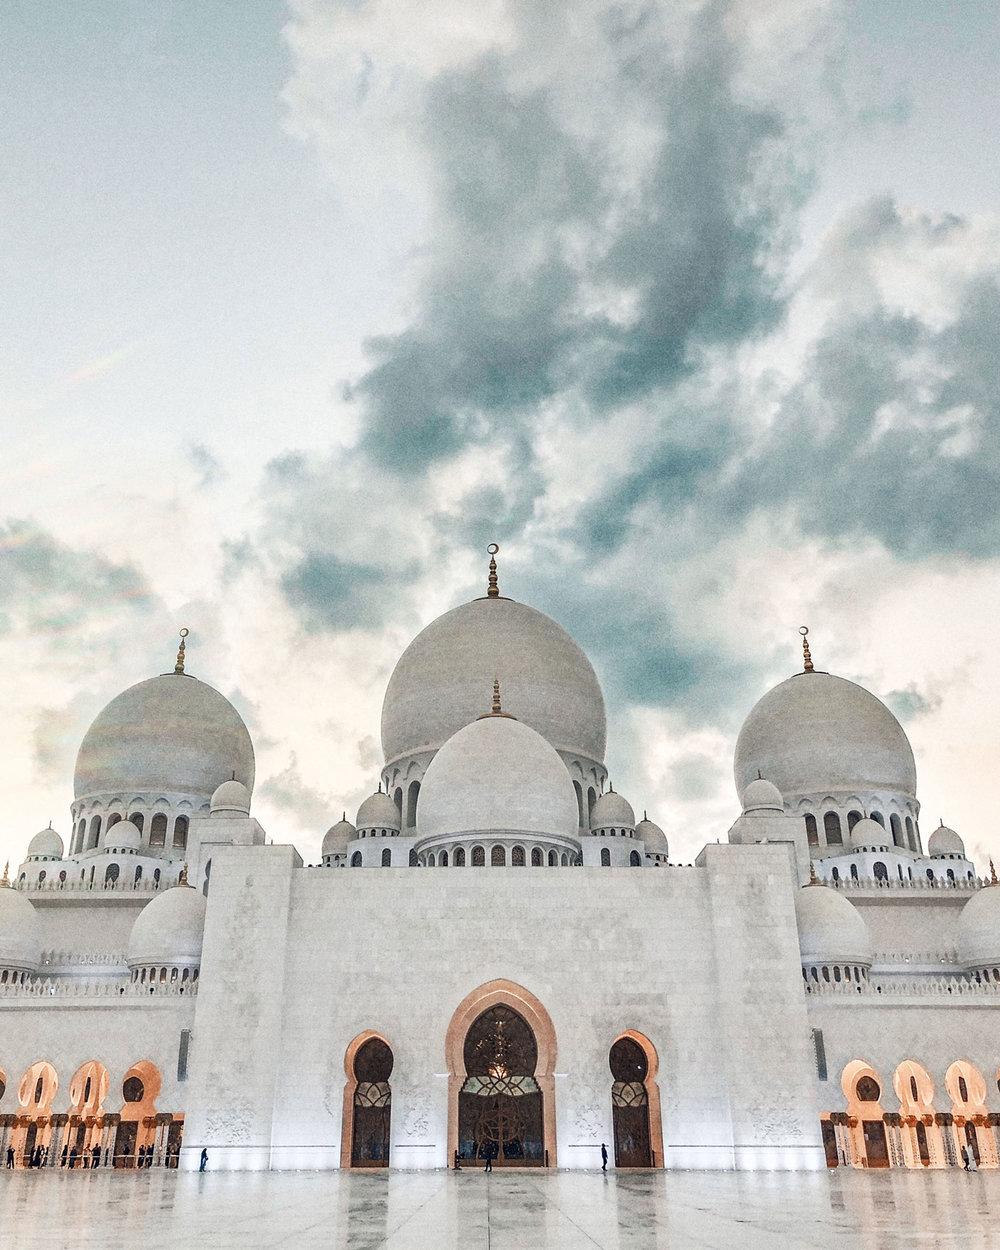 Zayed Mosque Abu Dhabi Travel Photography / Dubai Travel Tips